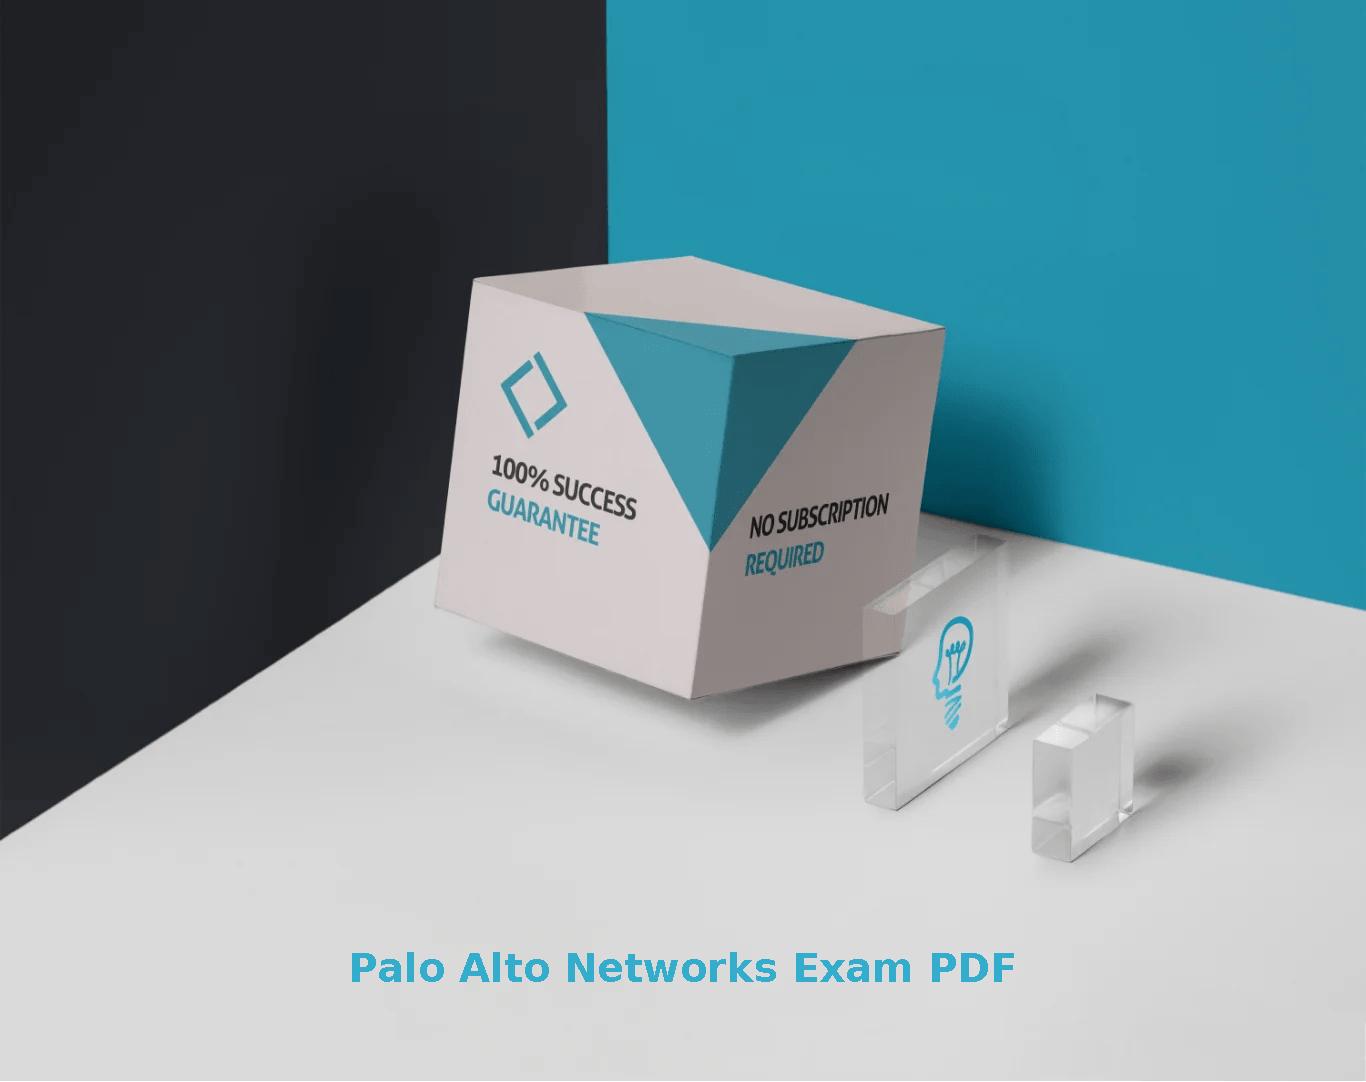 Palo Alto Networks Exam PDF